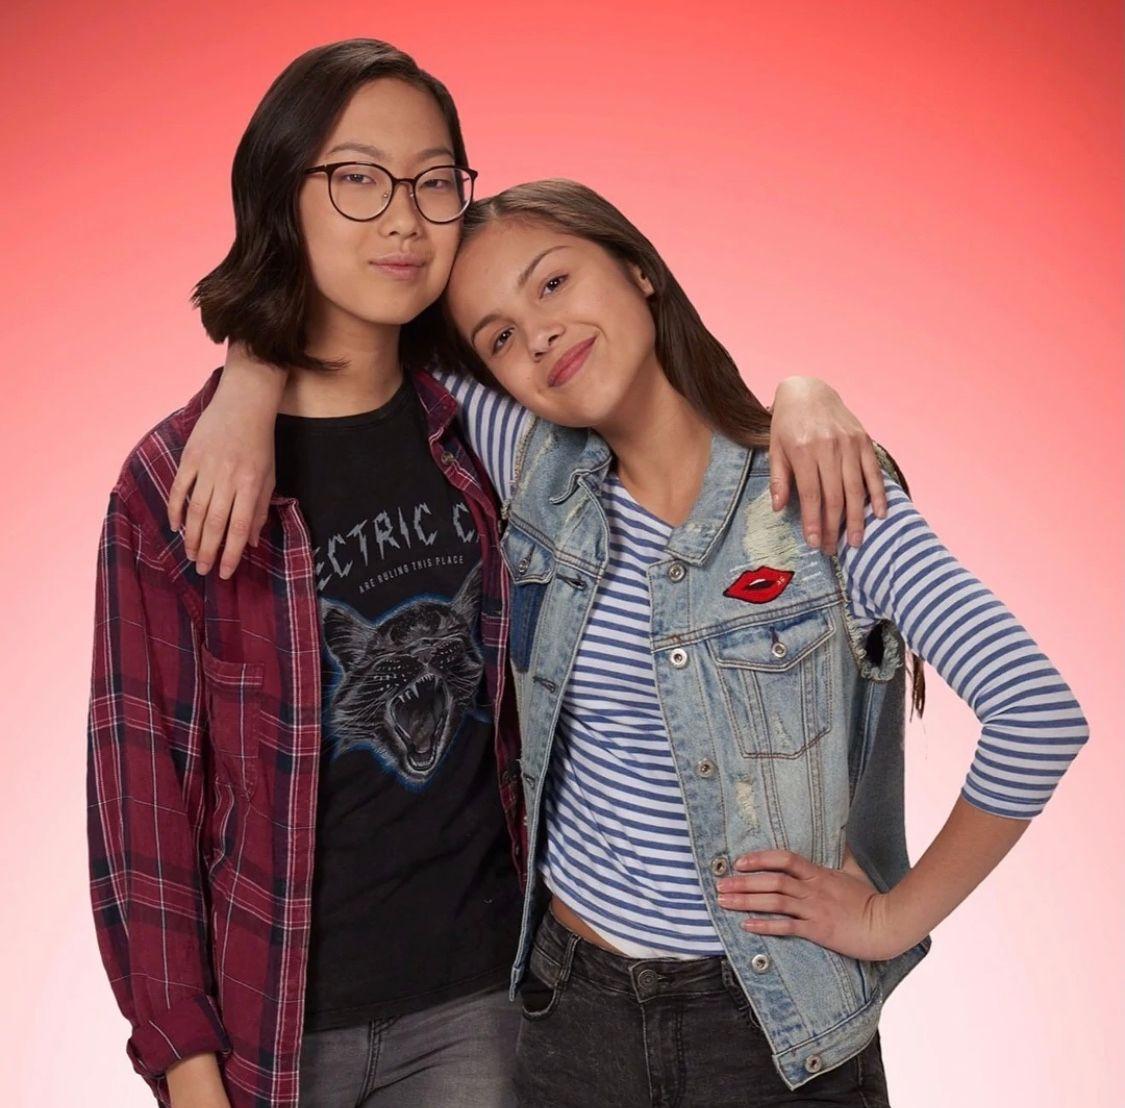 Madison Hu of 'Bizaardvark' wishes old costar Olivia Rodrigo a happy birthday in new Instagram post.